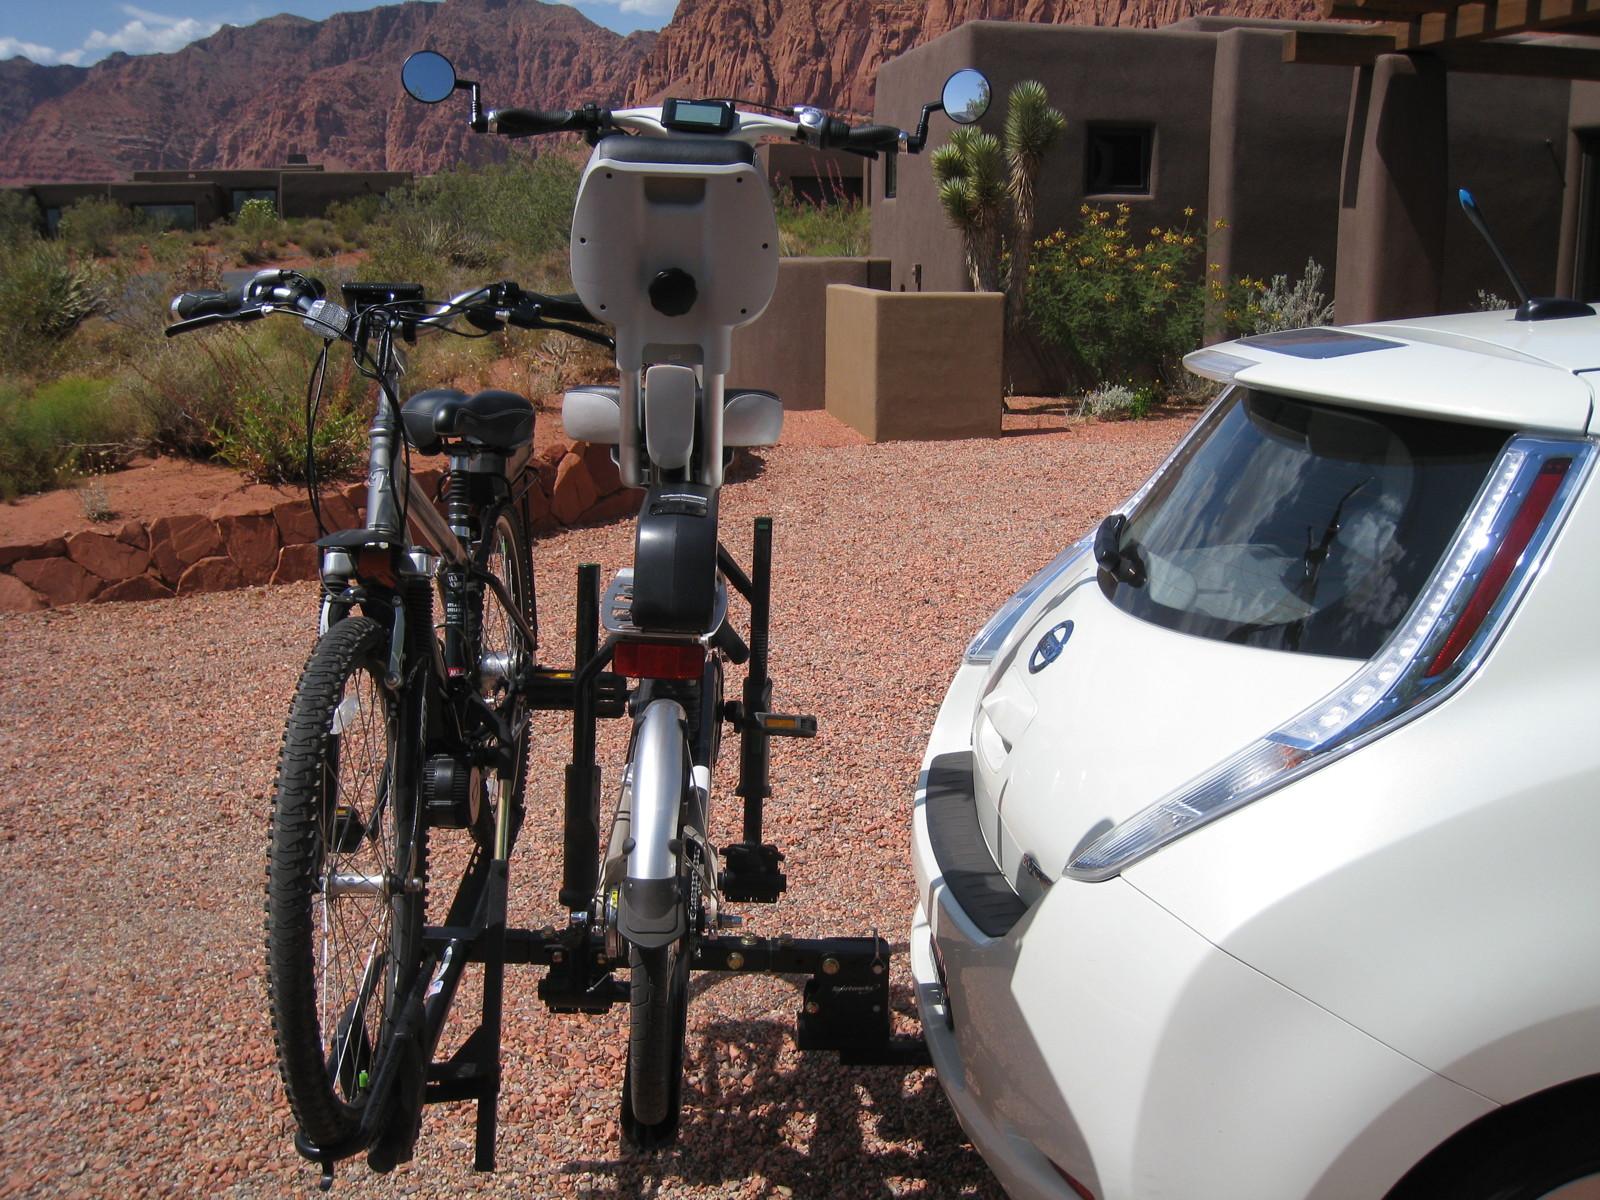 marketplace mount attached hitch images rennlist parts discussion forums trailer rack img porsche custom bike